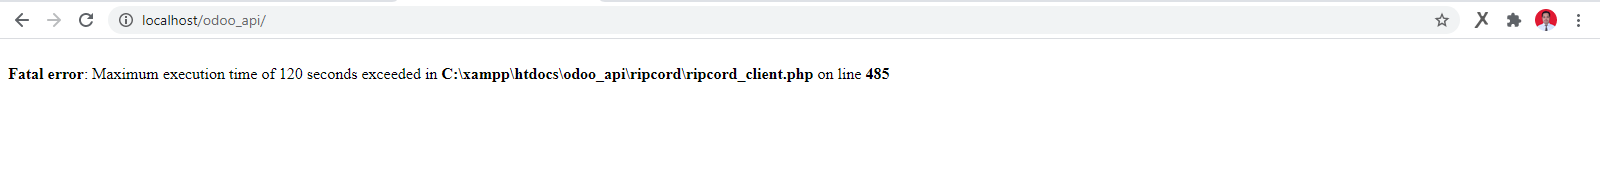 Ripcord menyebabkan error maximum execution time